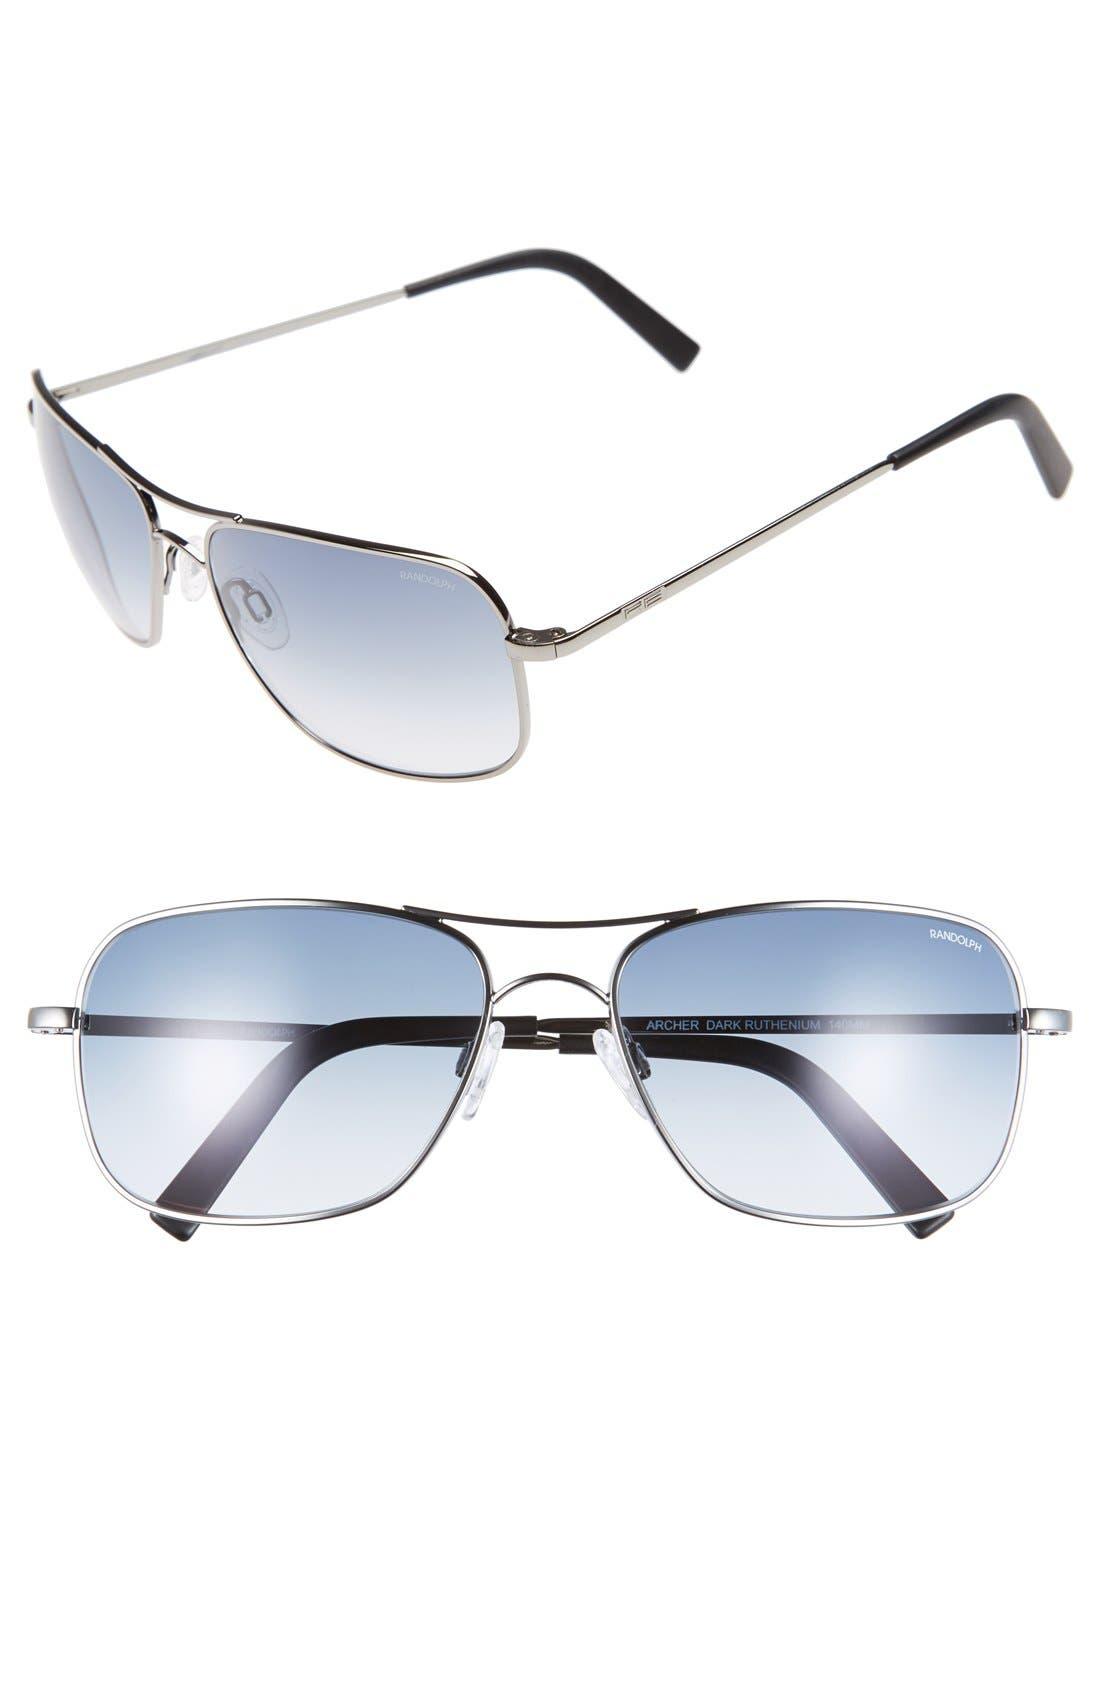 Randolph Engineering 'Archer' 59mm Sunglasses